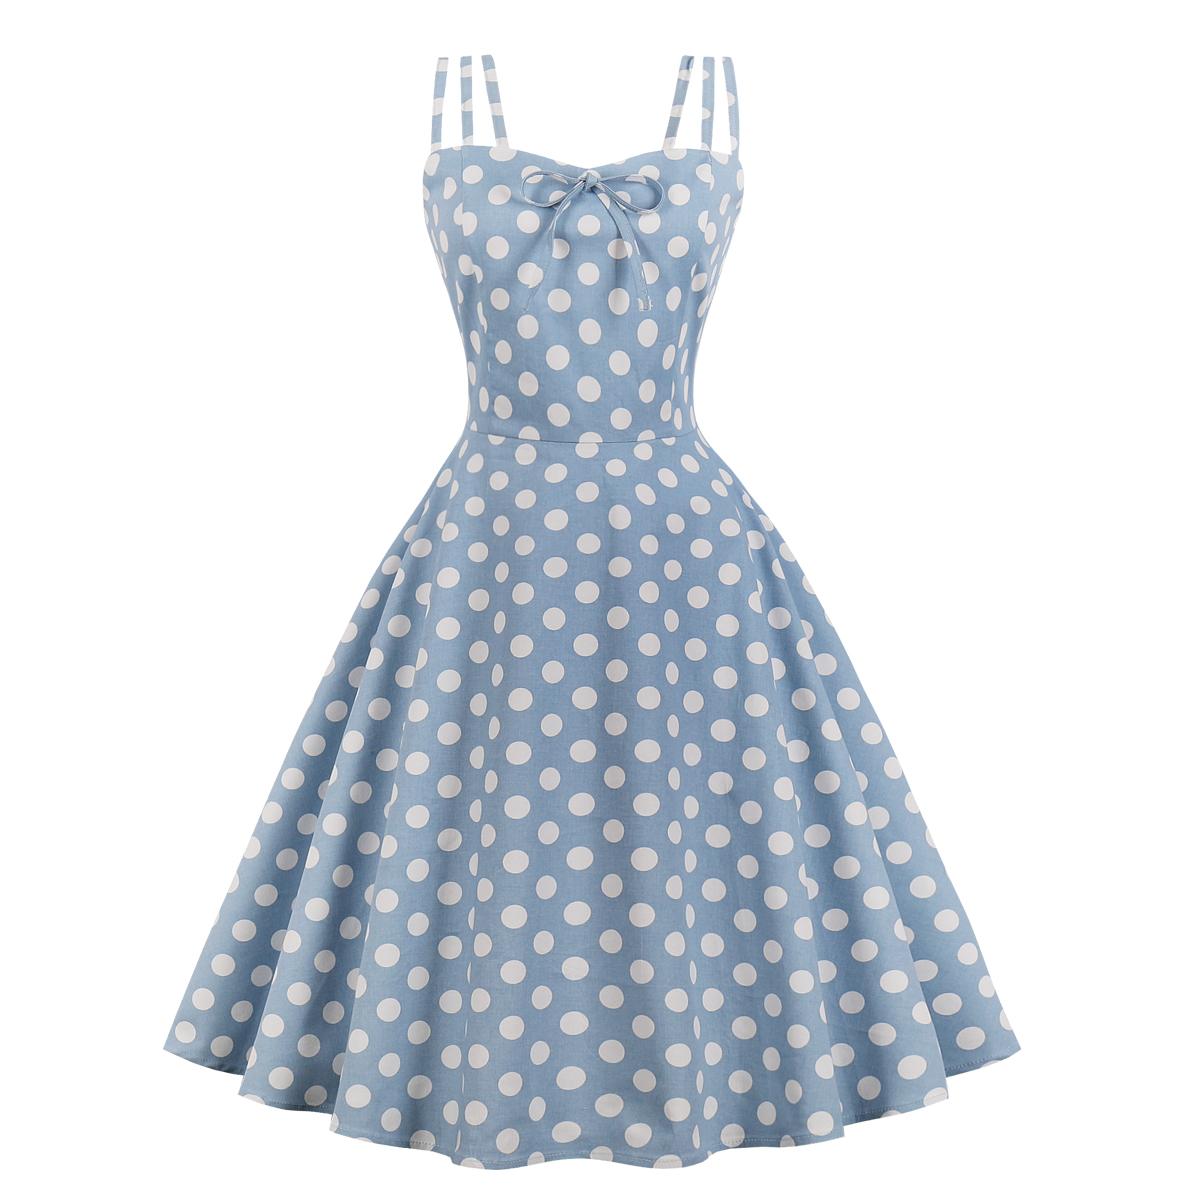 Retro 50s Polka Dot Dress